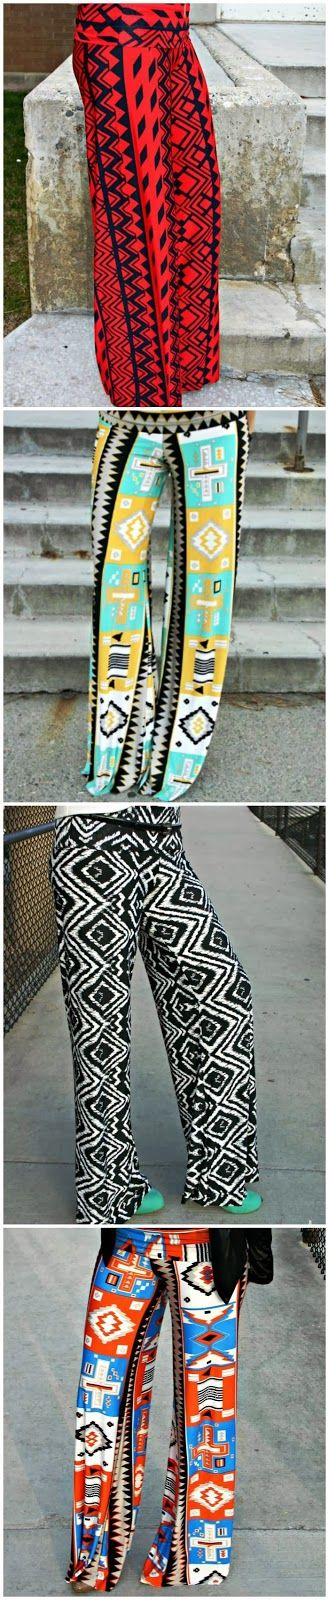 Exumas Pant Perfection   Fashionista Tribe